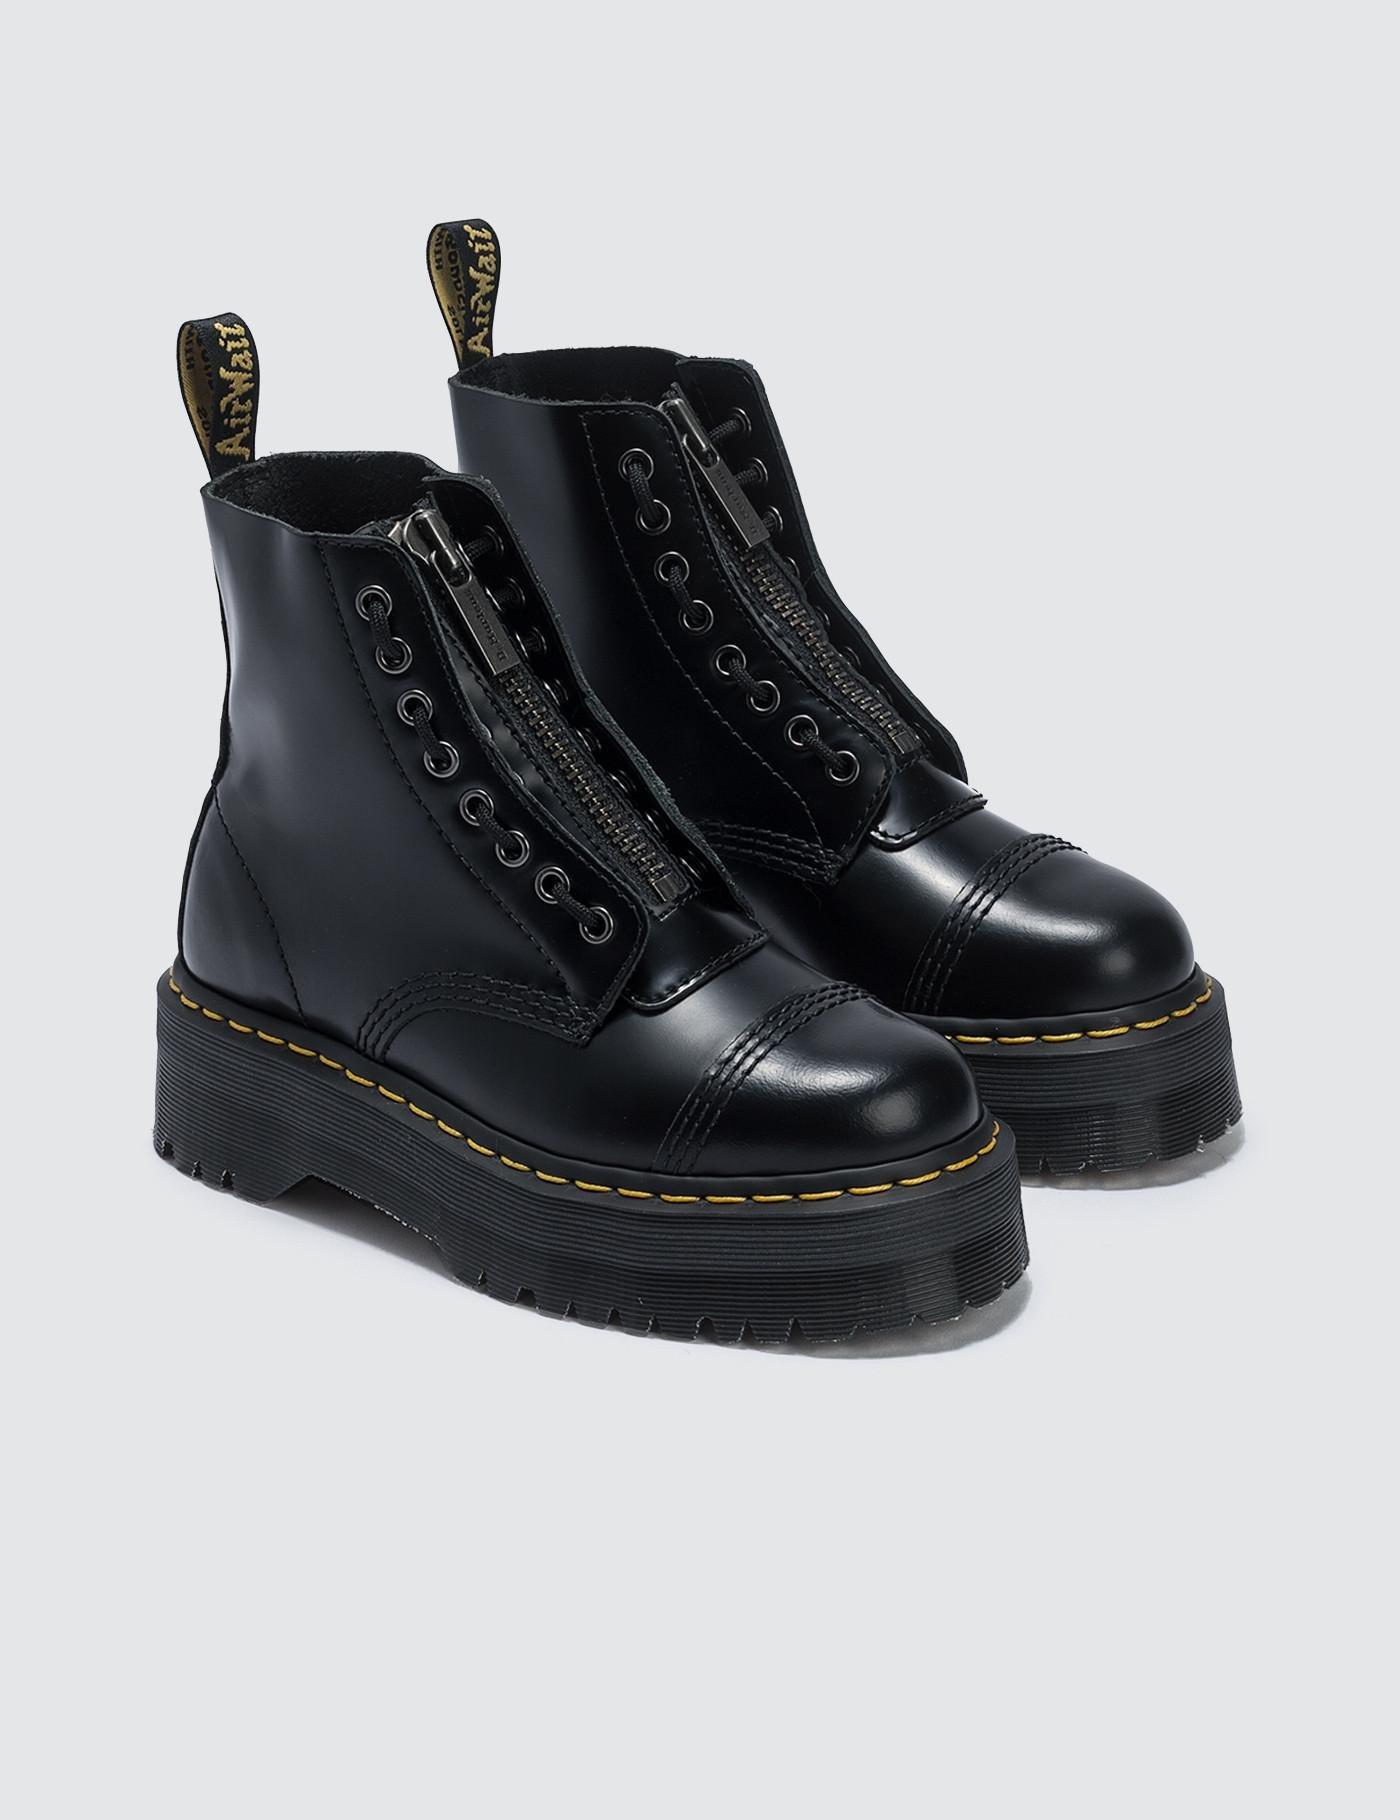 7ecb64012ed2 Lyst - Dr. Martens Sinclair Black Polished Smooth in Black